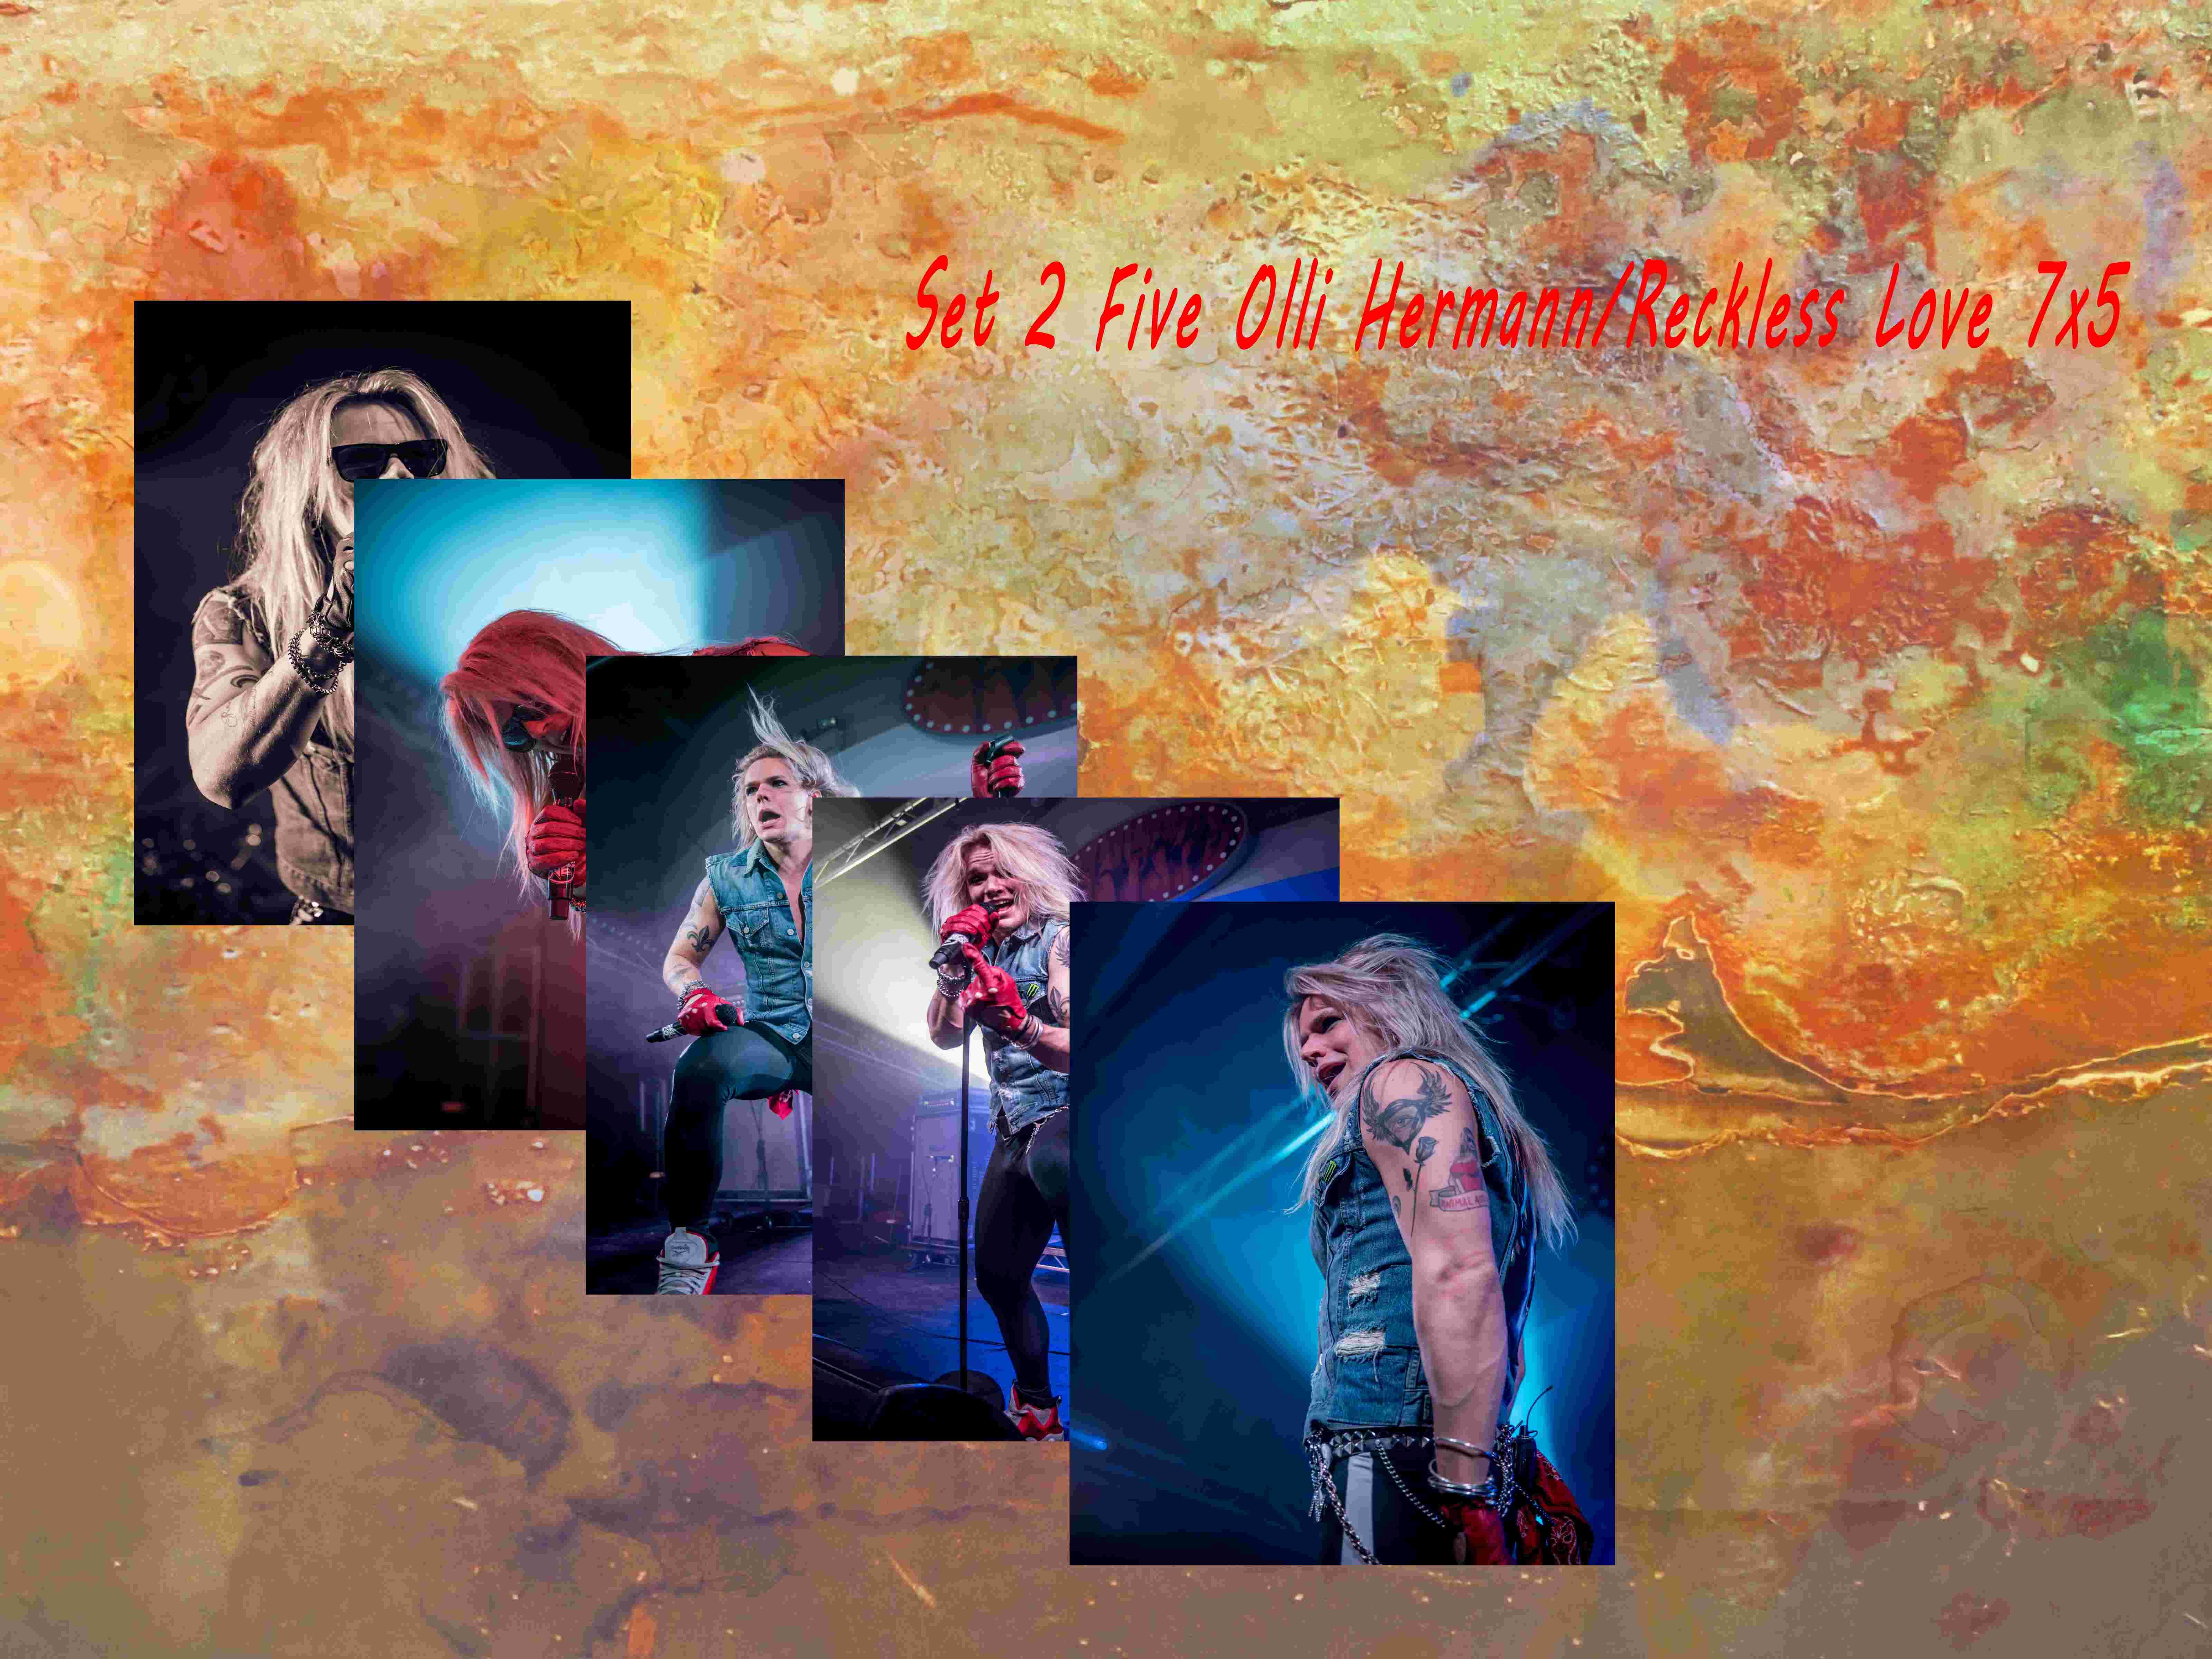 Set 4-2 Olli Reckless Love 7 X 5